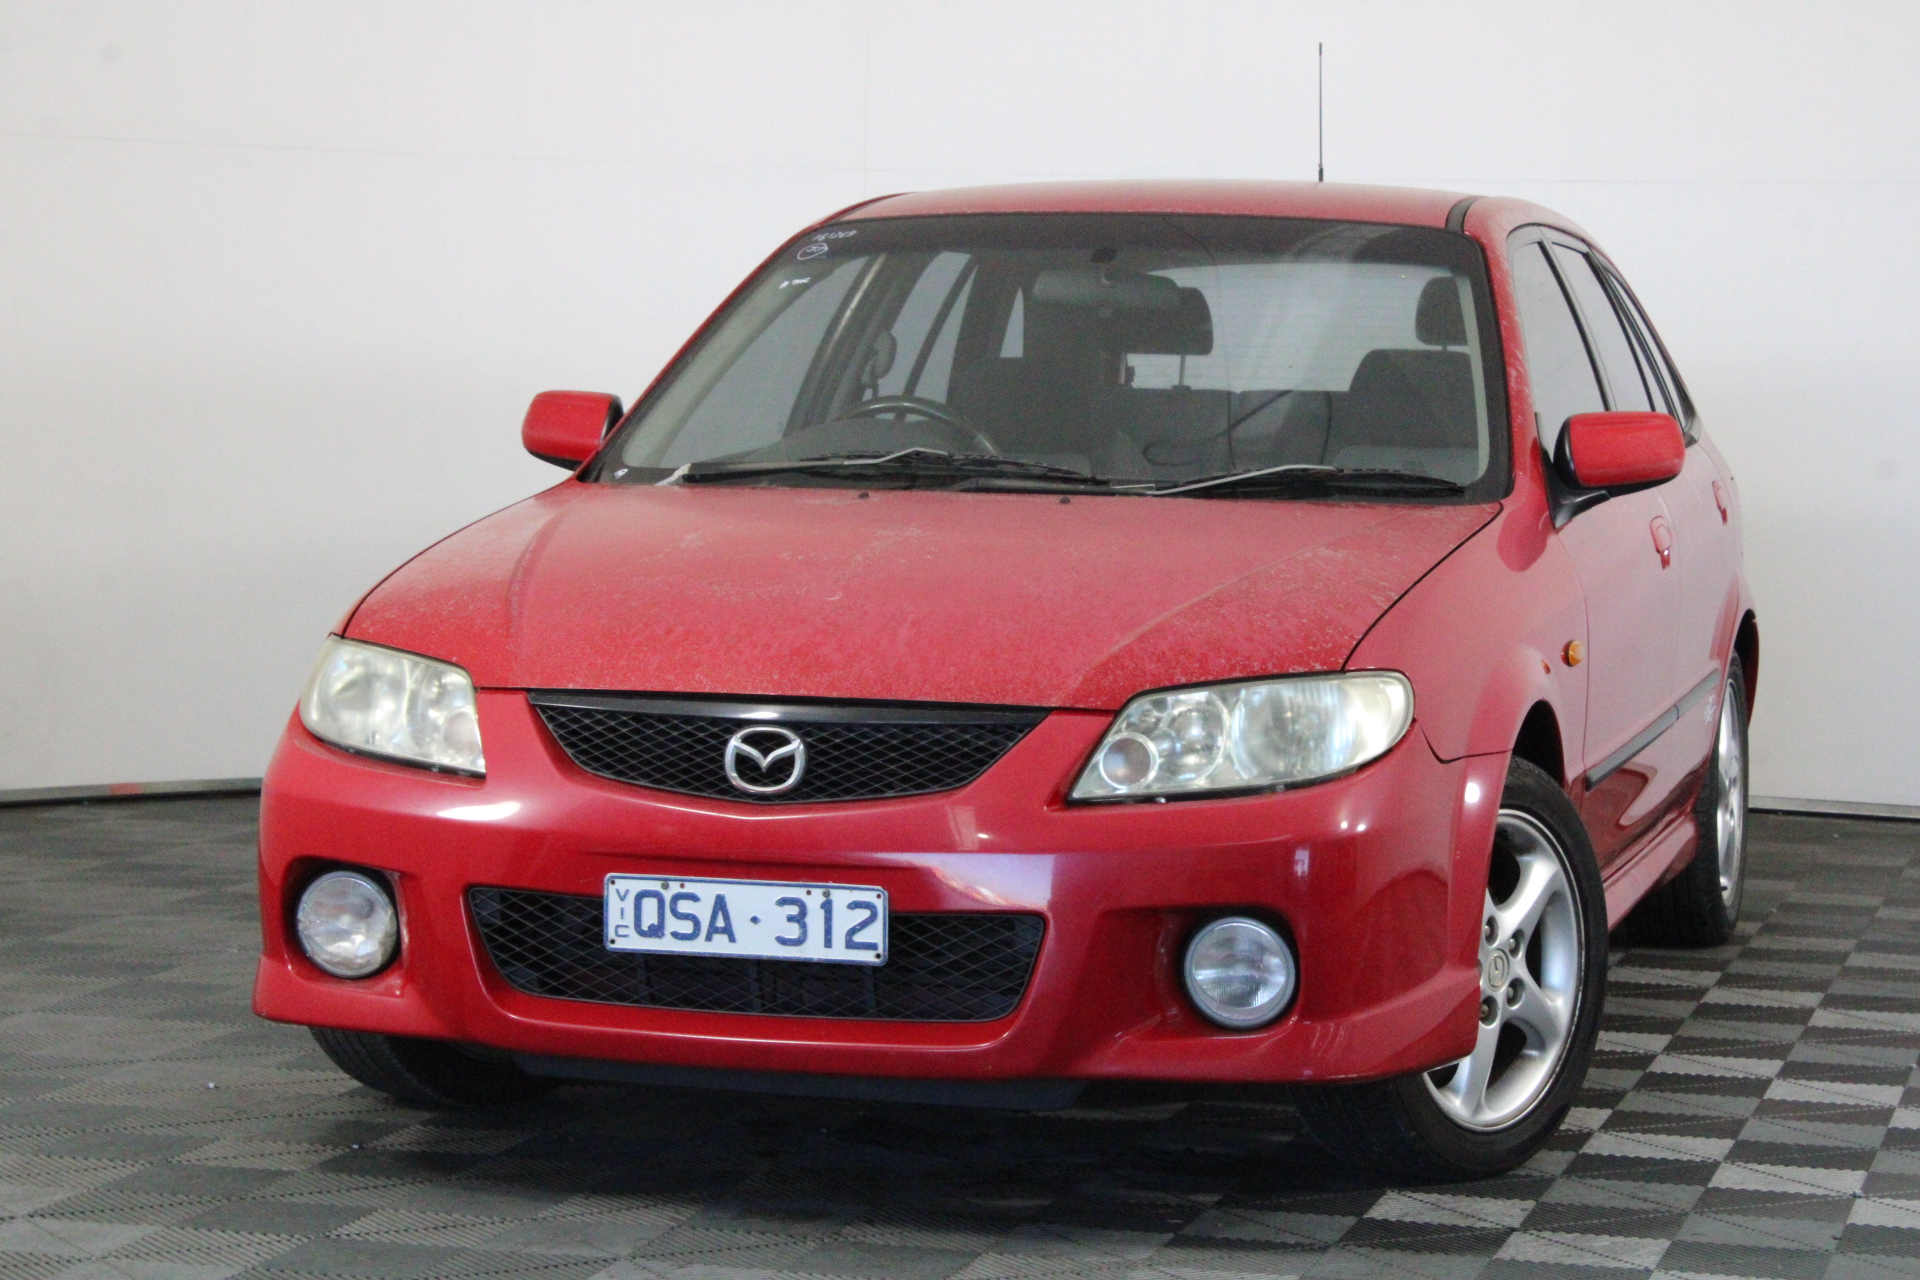 2001 Mazda 323 Astina SP20 BJ Manual Hatchback